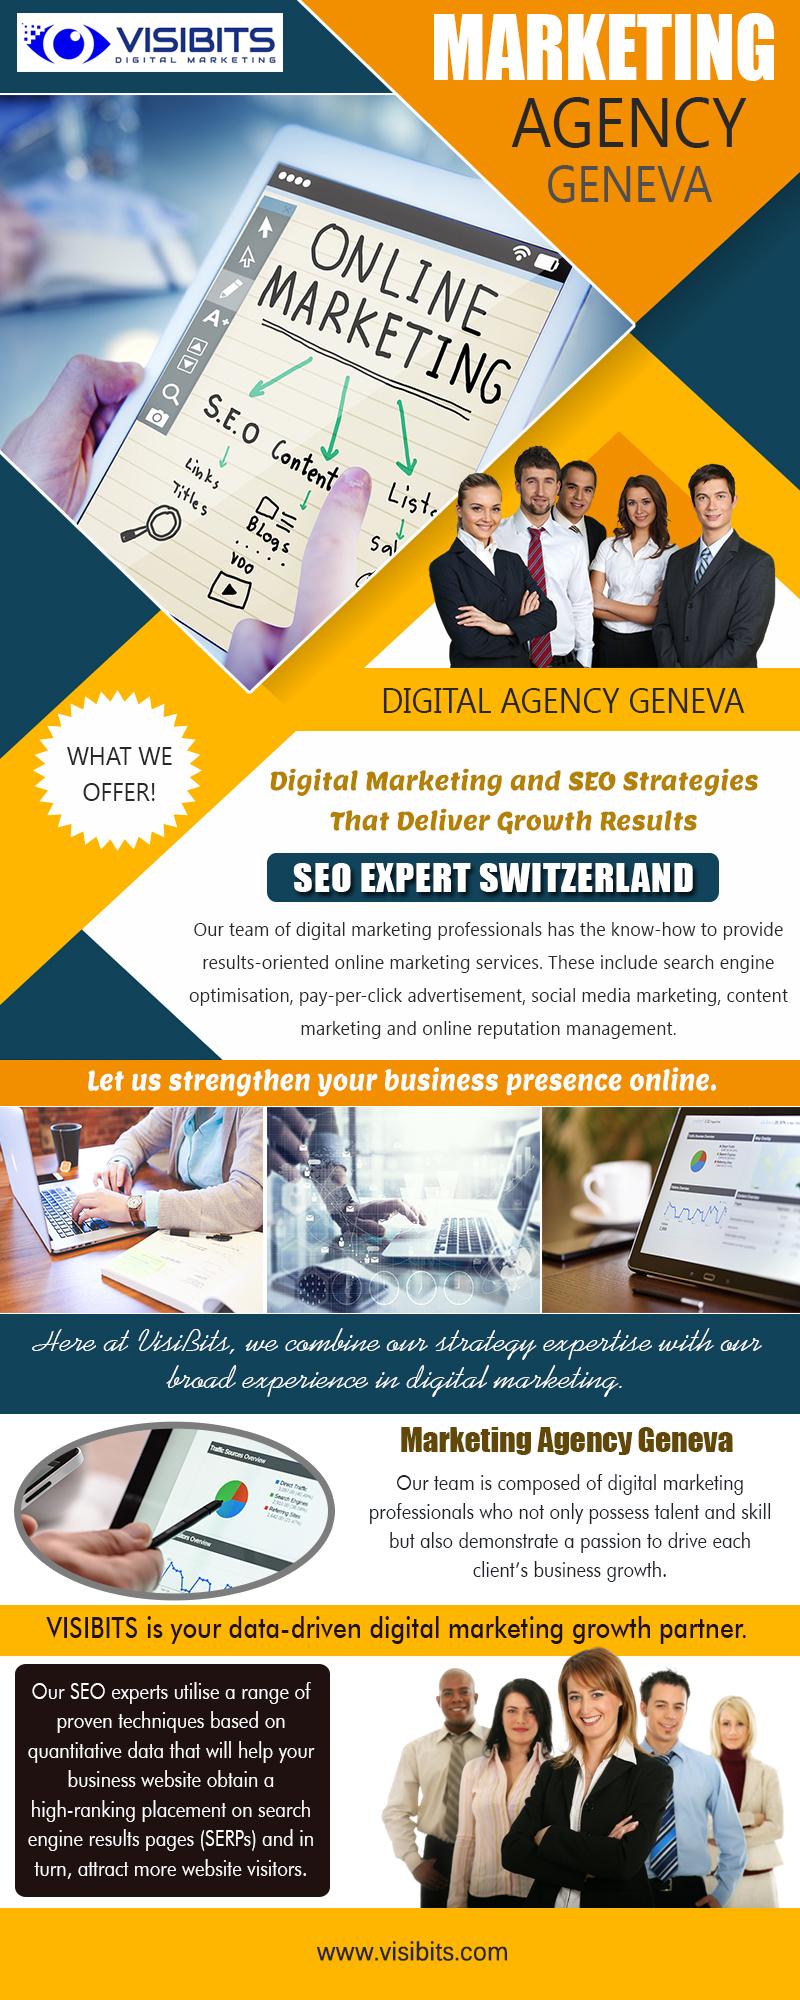 MarketingAgencyGeneva